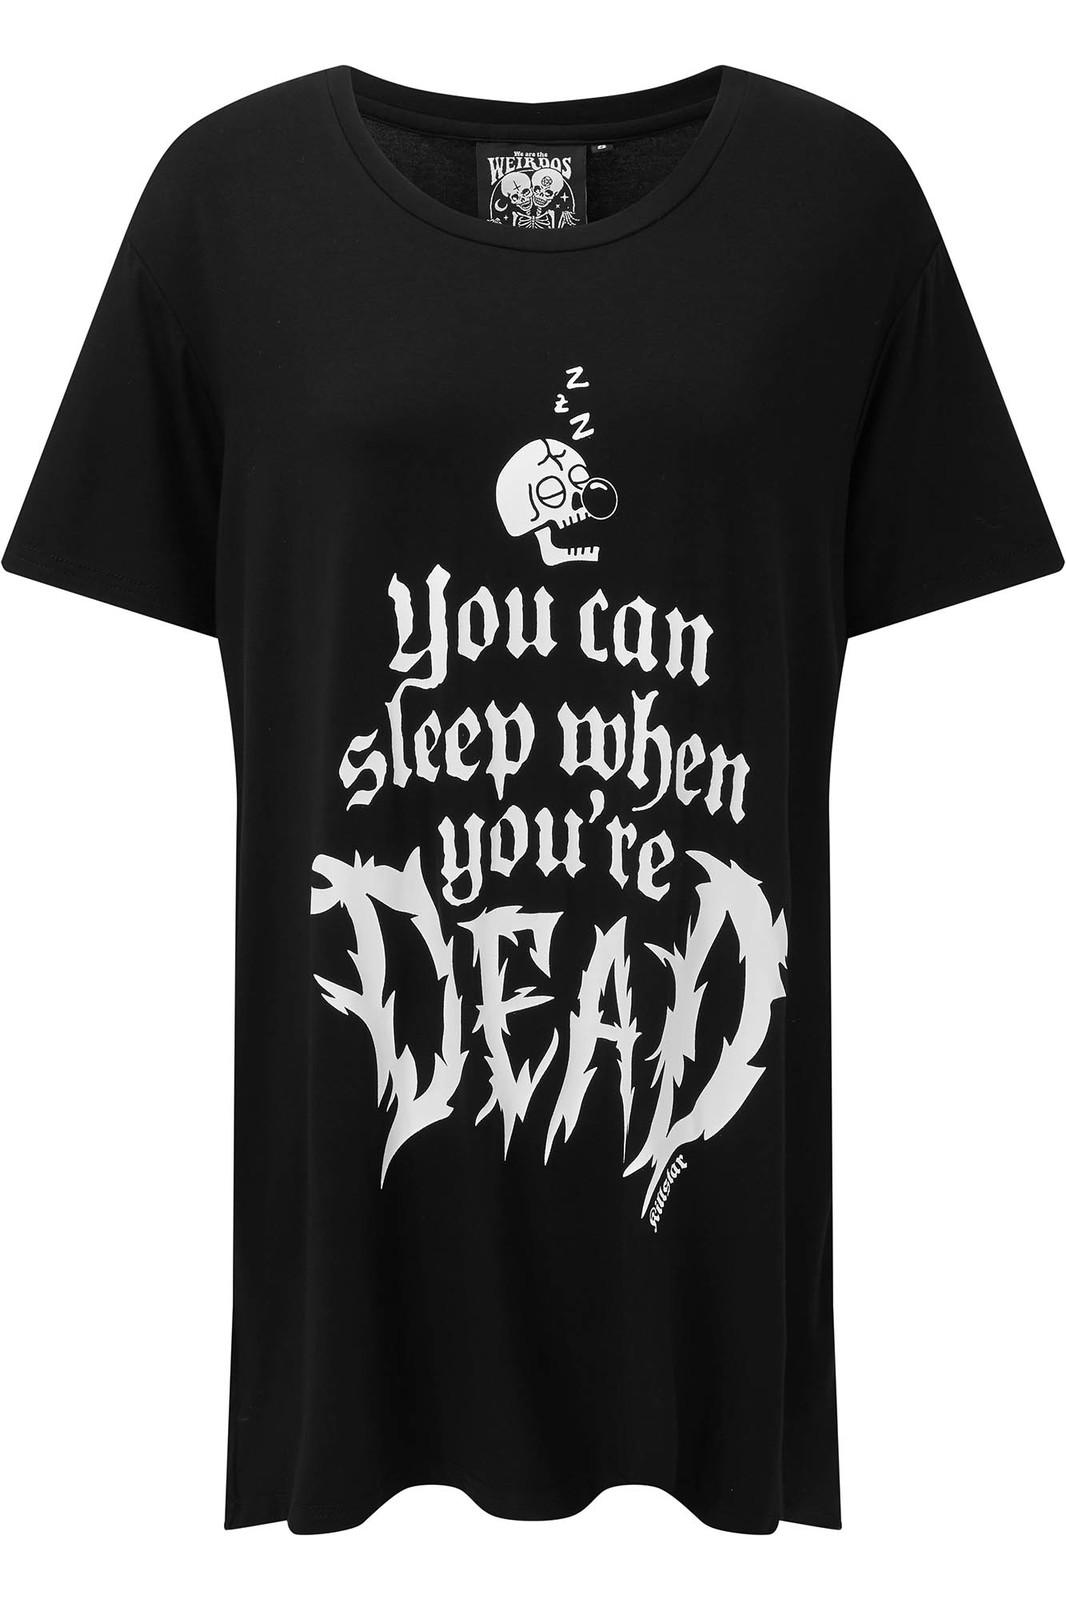 Killstar: Dead Sleepy Sleep-Shirt - M image